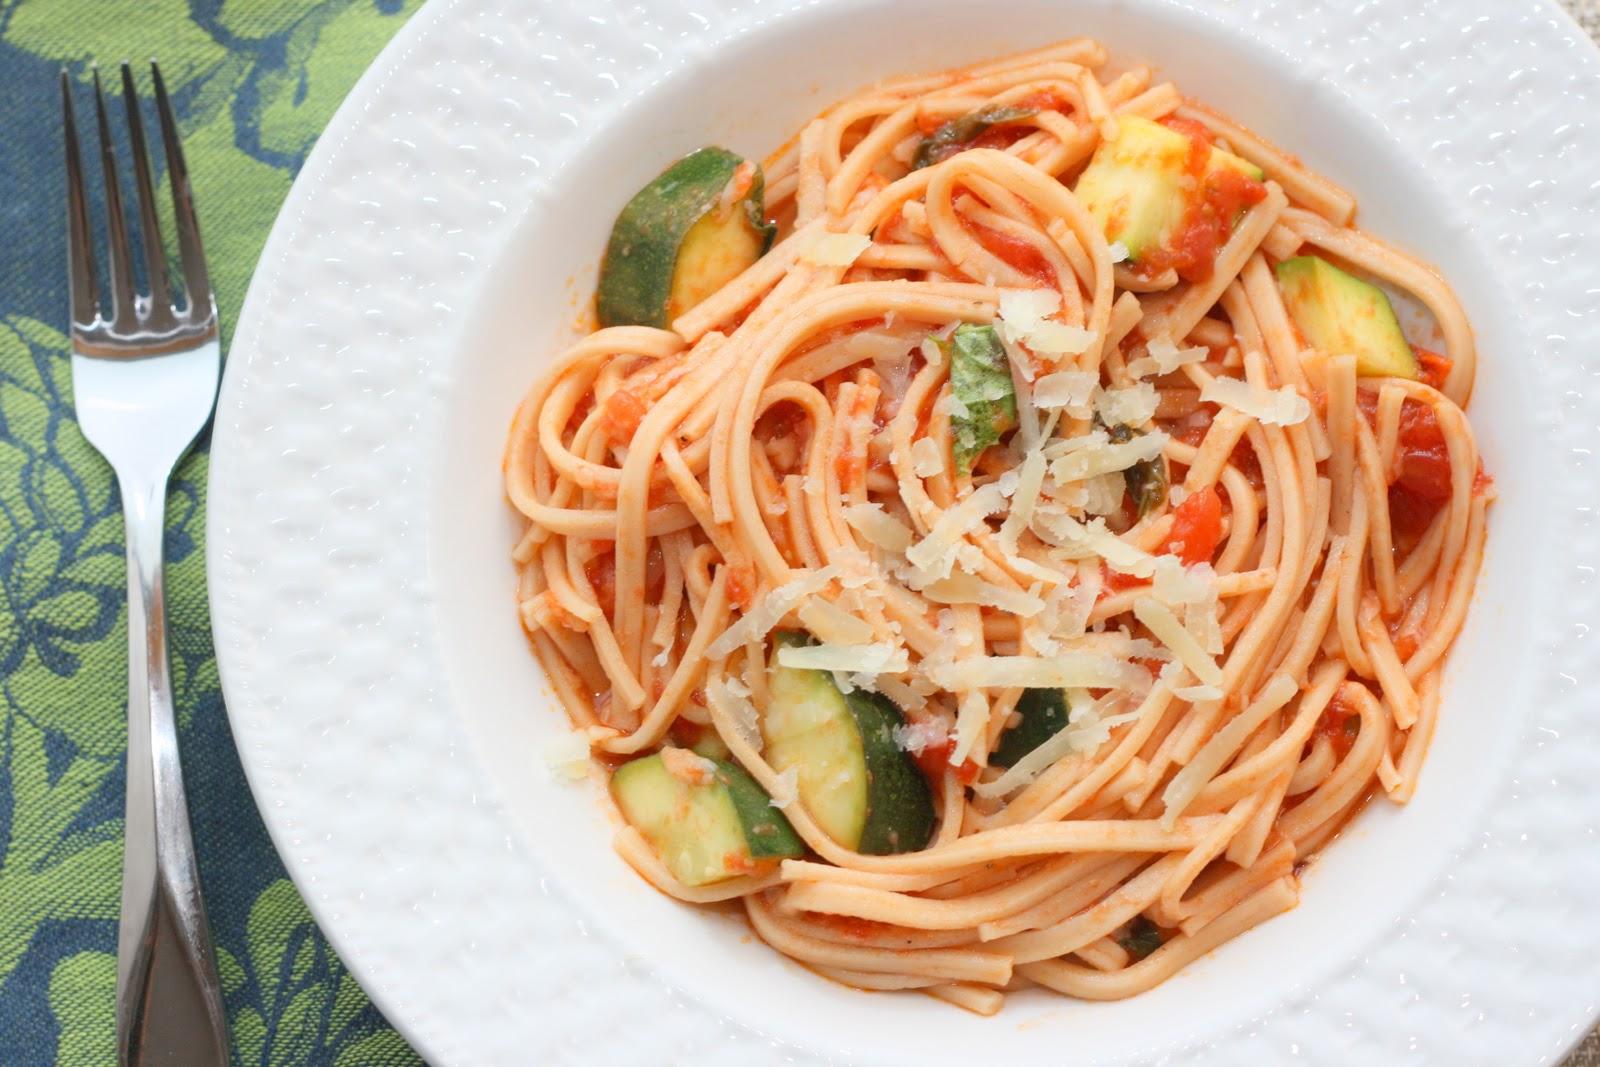 ... Bitchin' Kitchin': Red Onion Pasta with Spicy Zucchini-Tomato Sauce